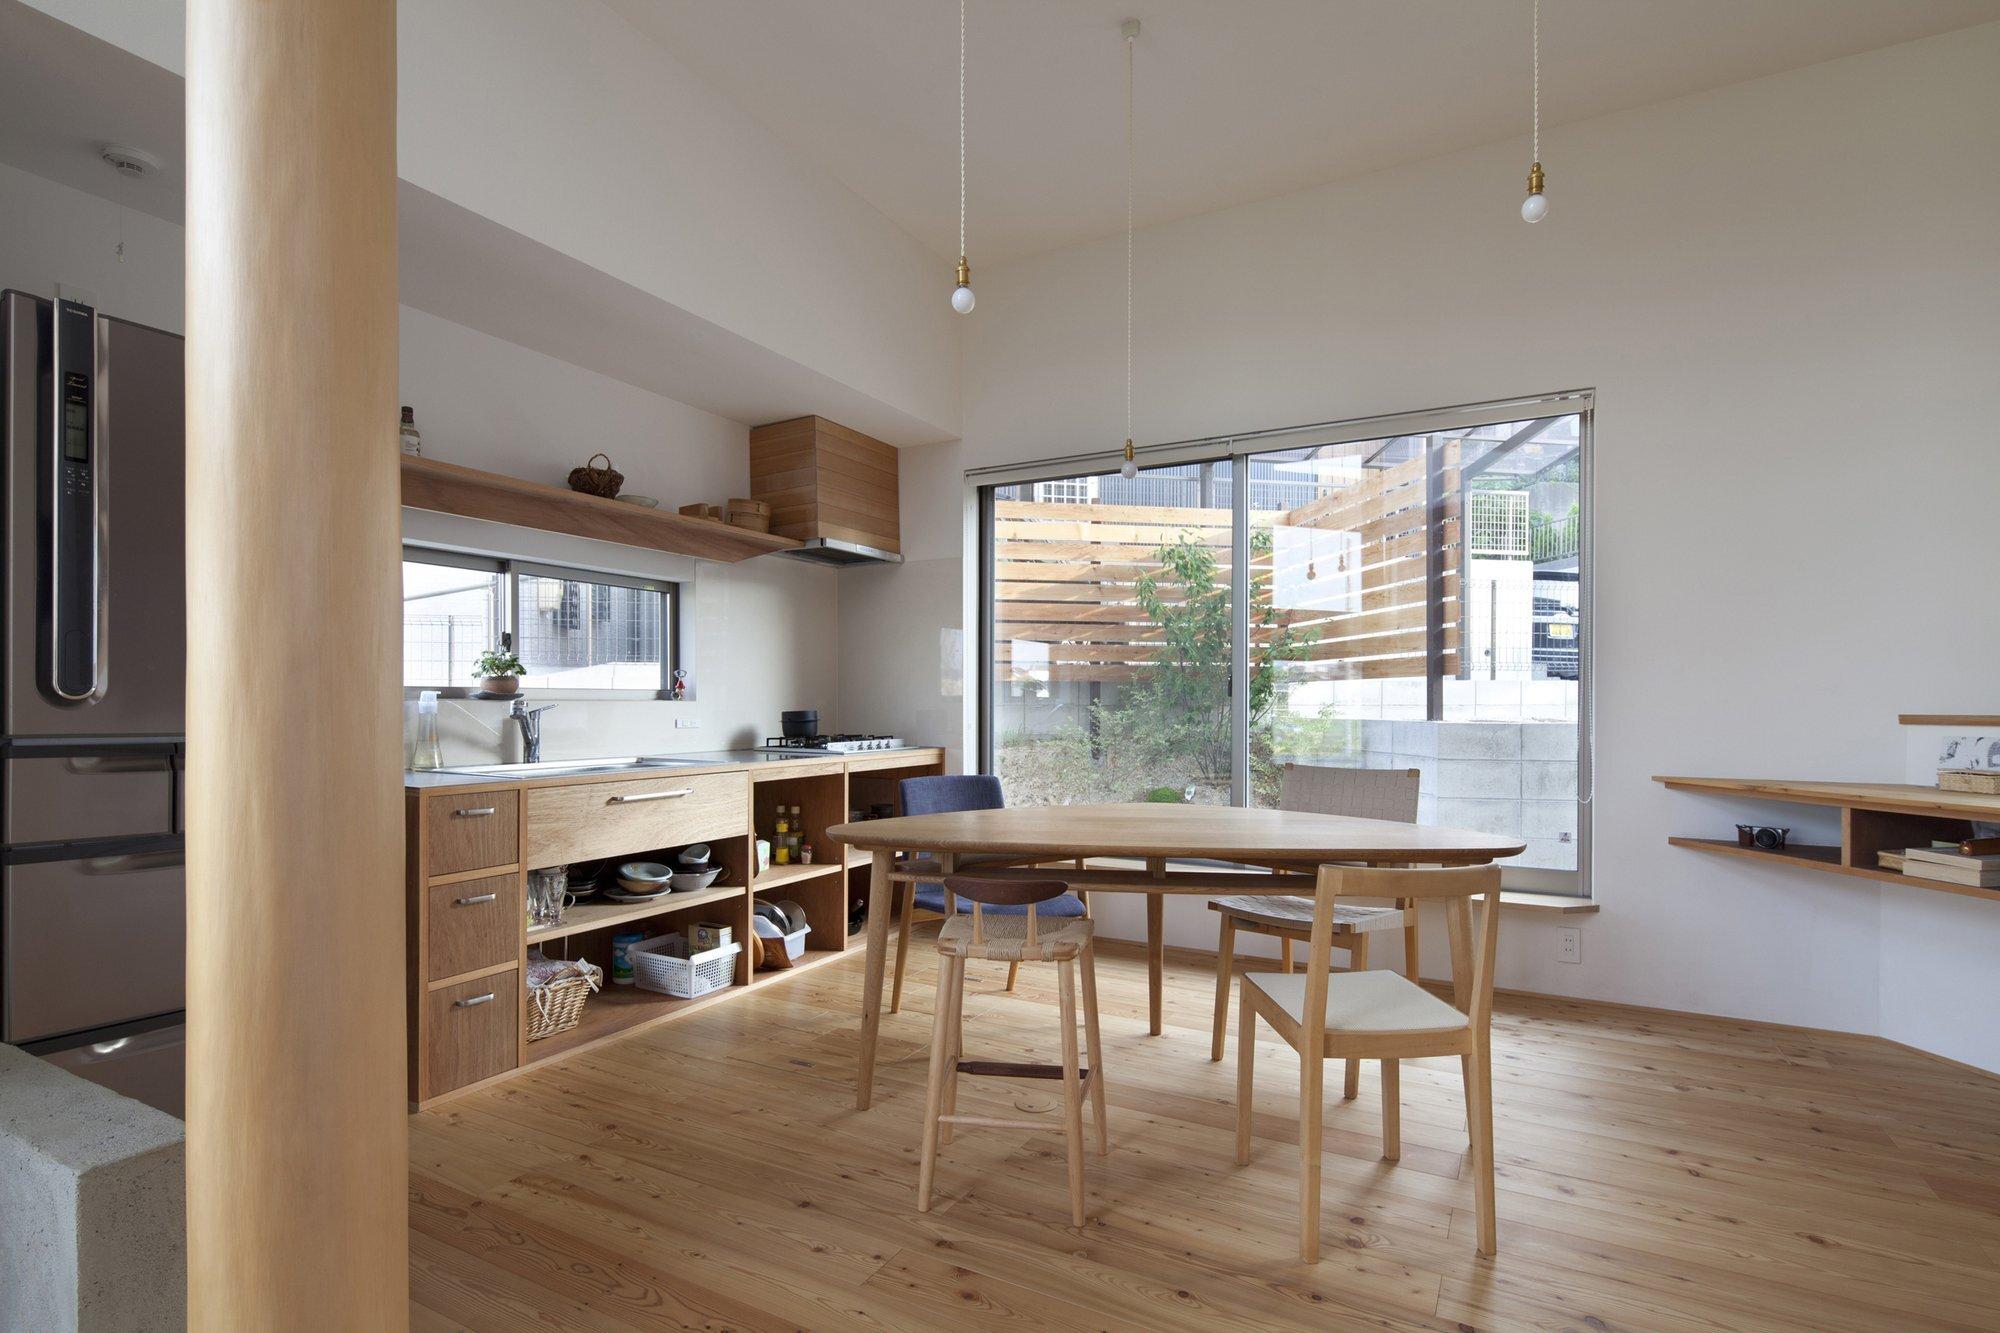 The Frontier House - Small Japanese House - Mamiya Shinichi Design Studio - Toyoake Japan - Kitchen - Humble Homes